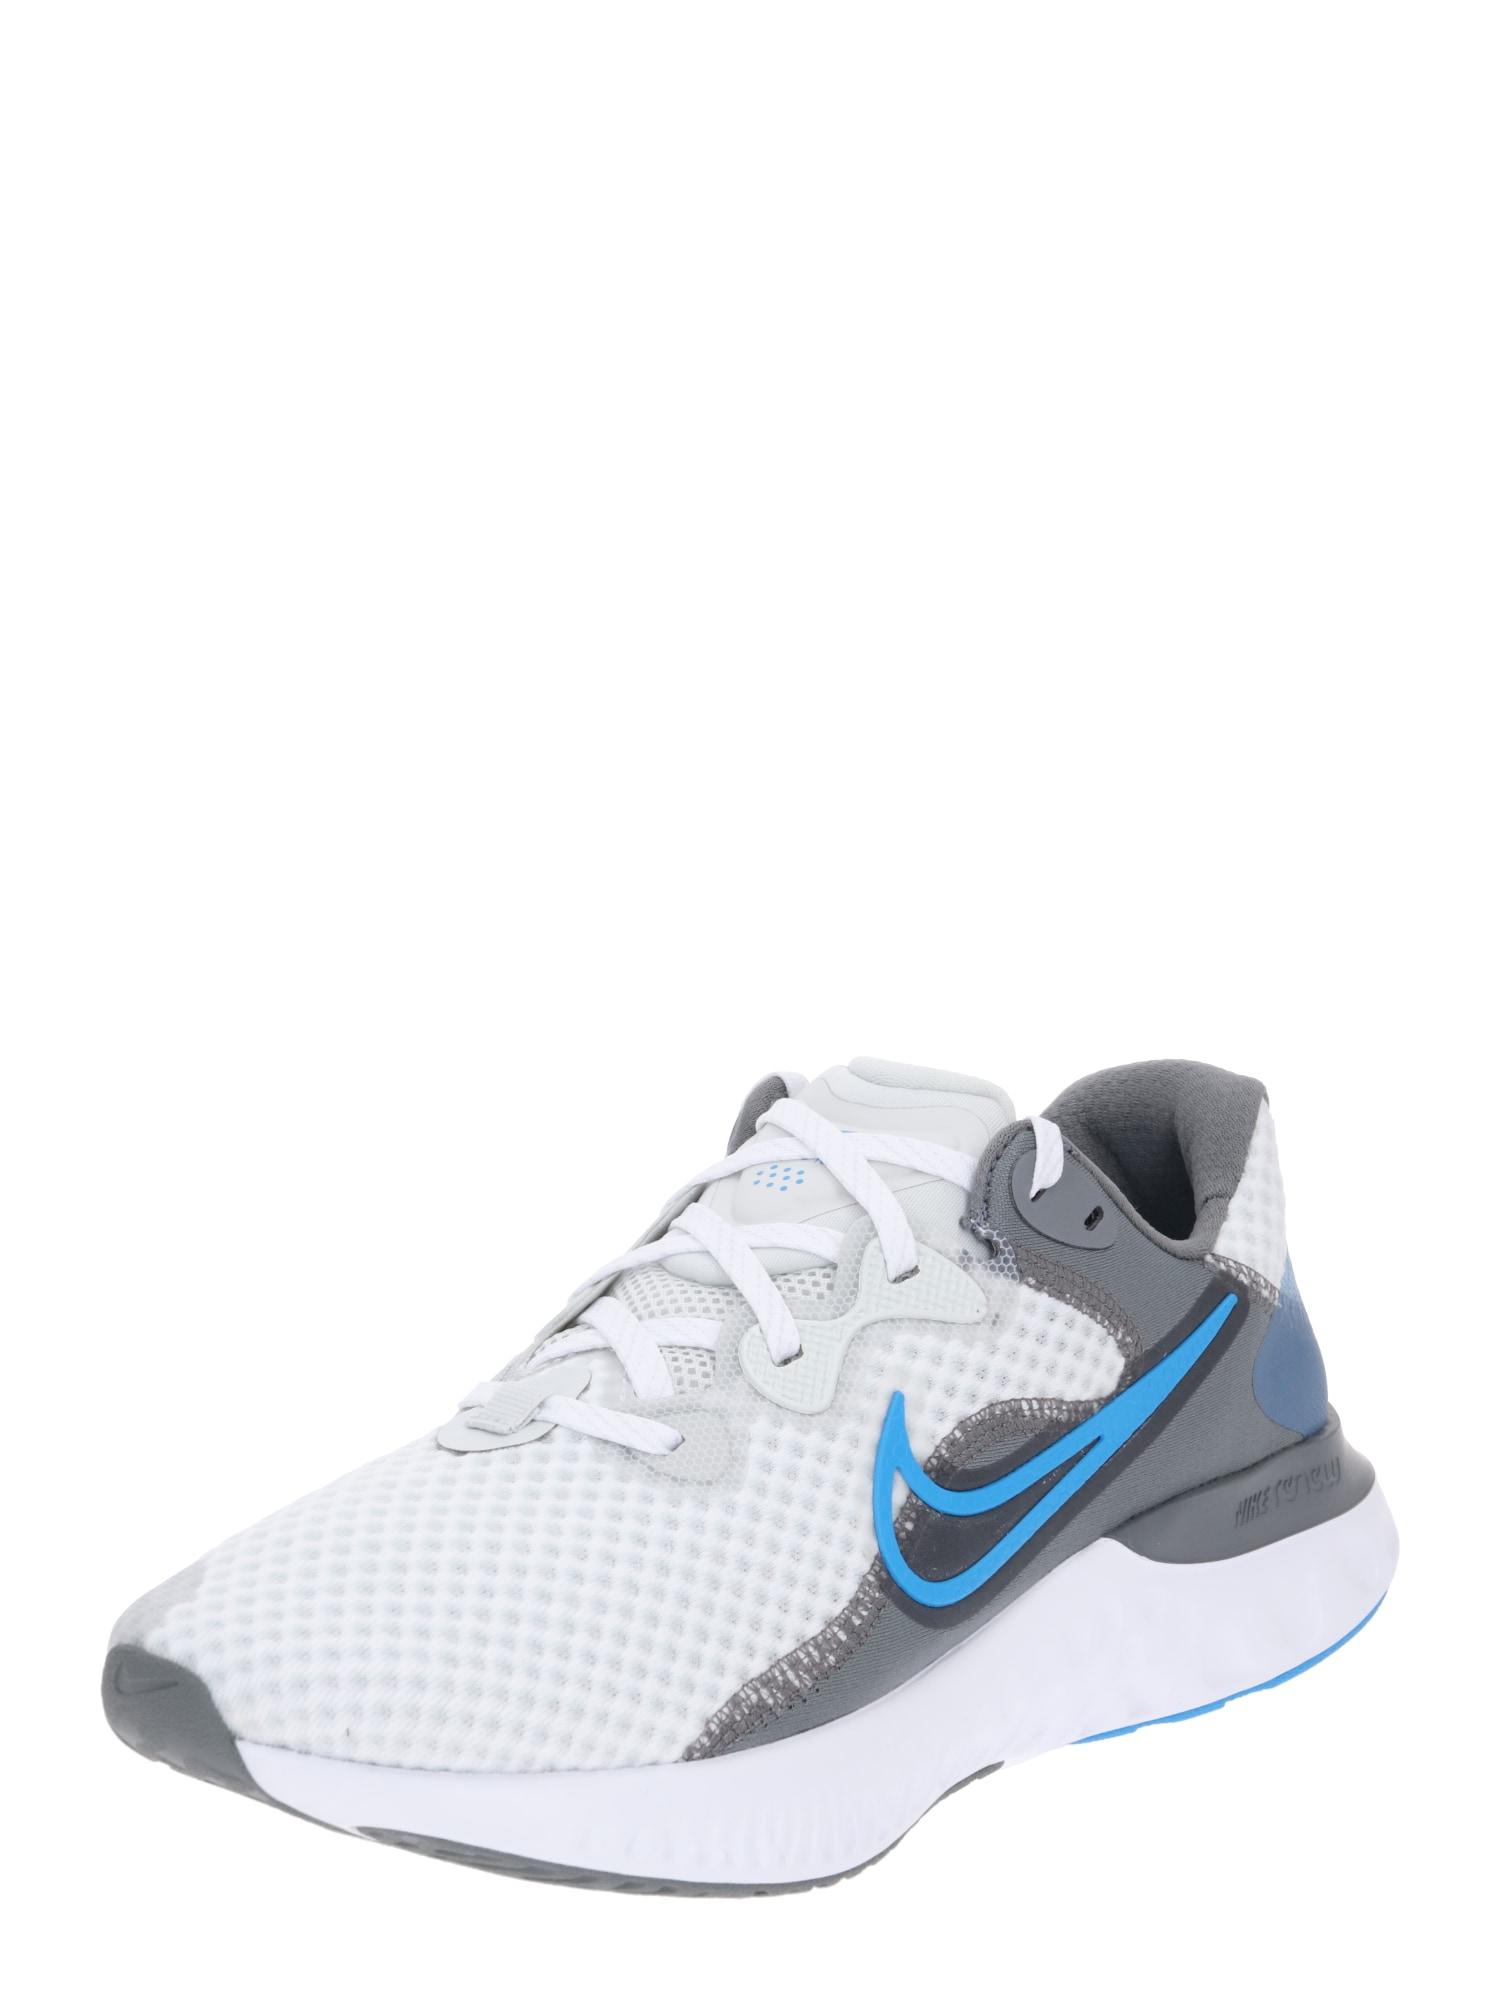 NIKE Běžecká obuv 'Renew Run 2'  šedá / bílá / aqua modrá